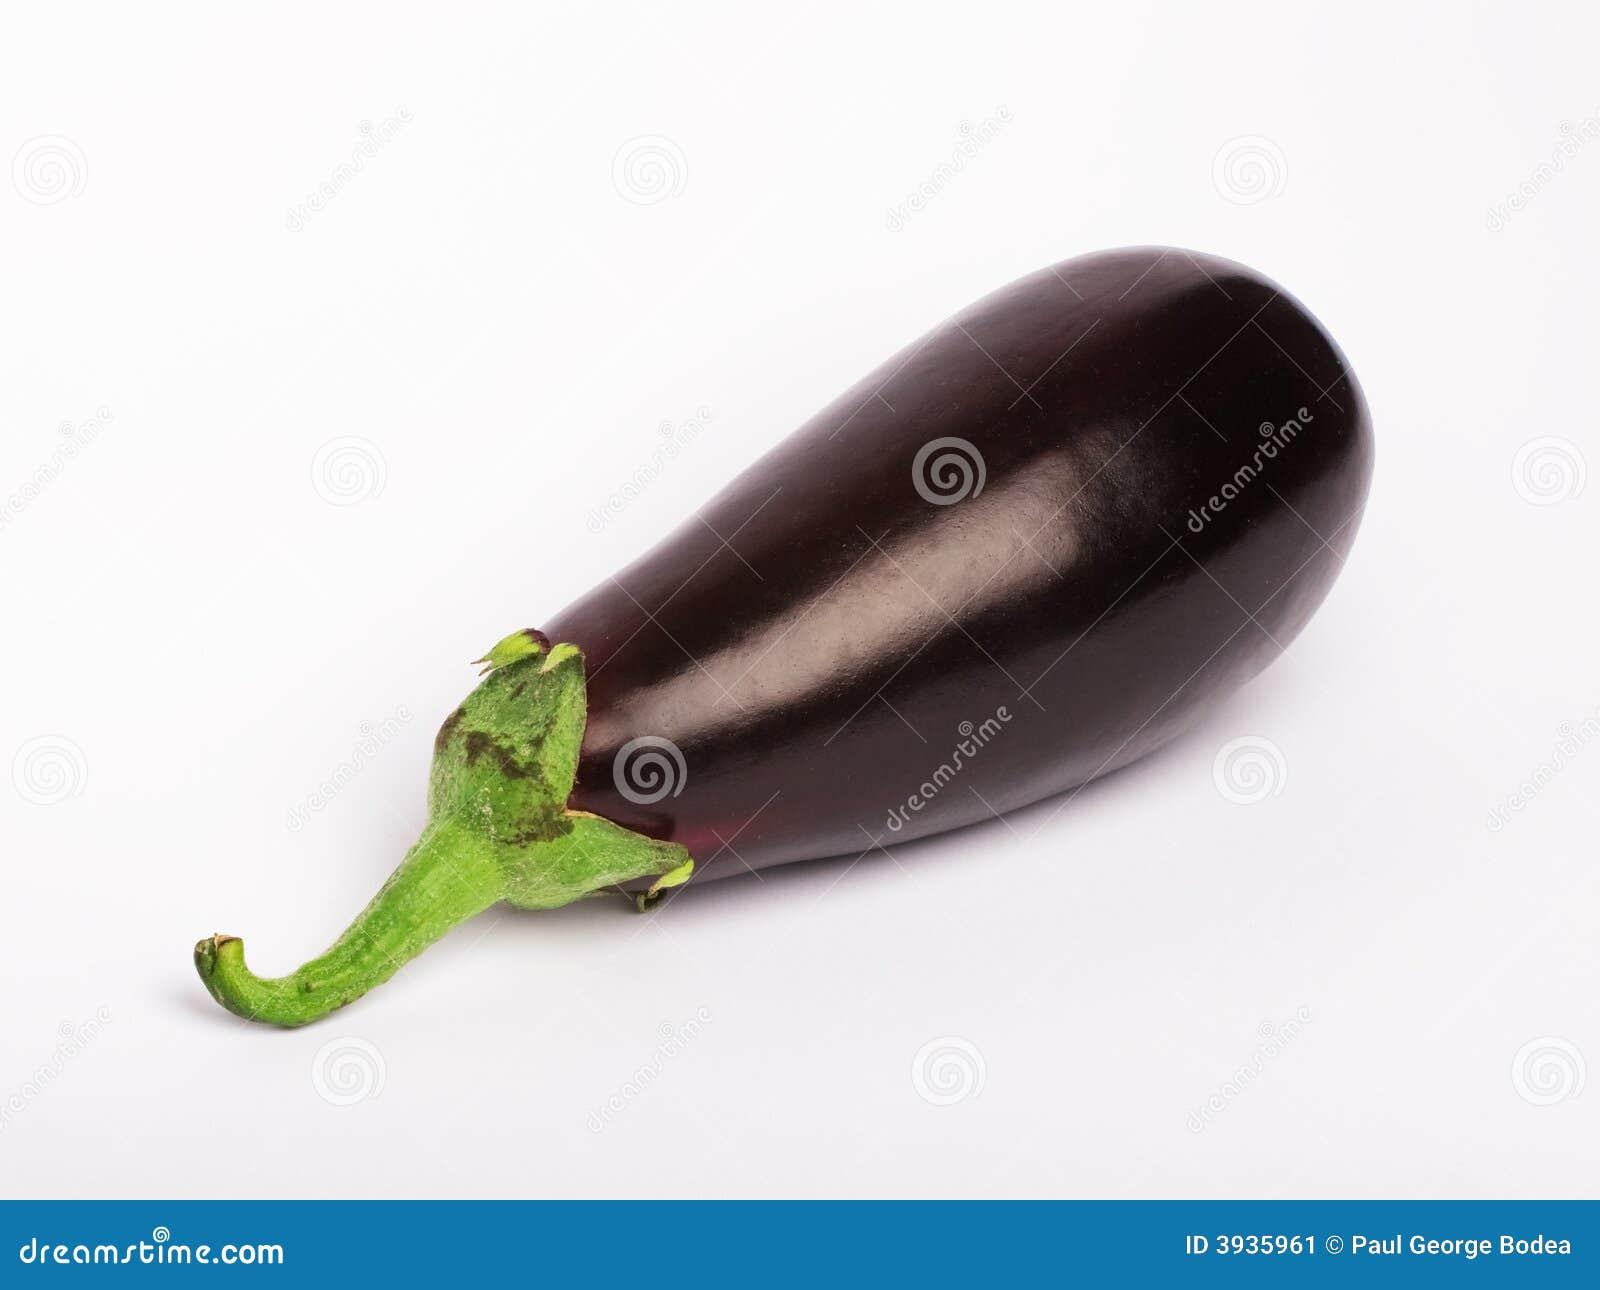 is eggplant a fruit olive vegetable or fruit